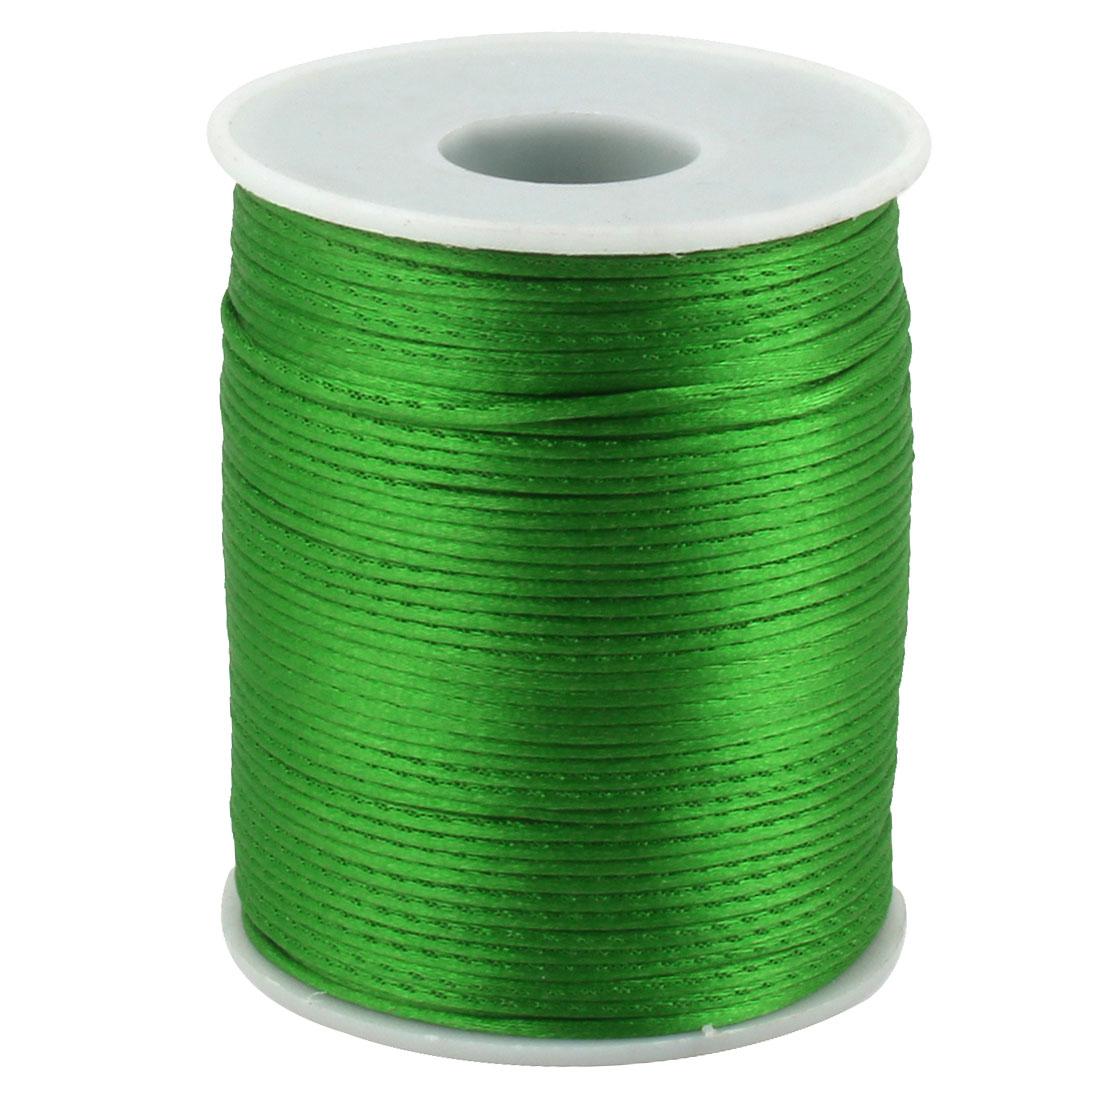 Festival Nylon DIY Craft Braided Chinese Knot Cord Thread String Green 109 Yards